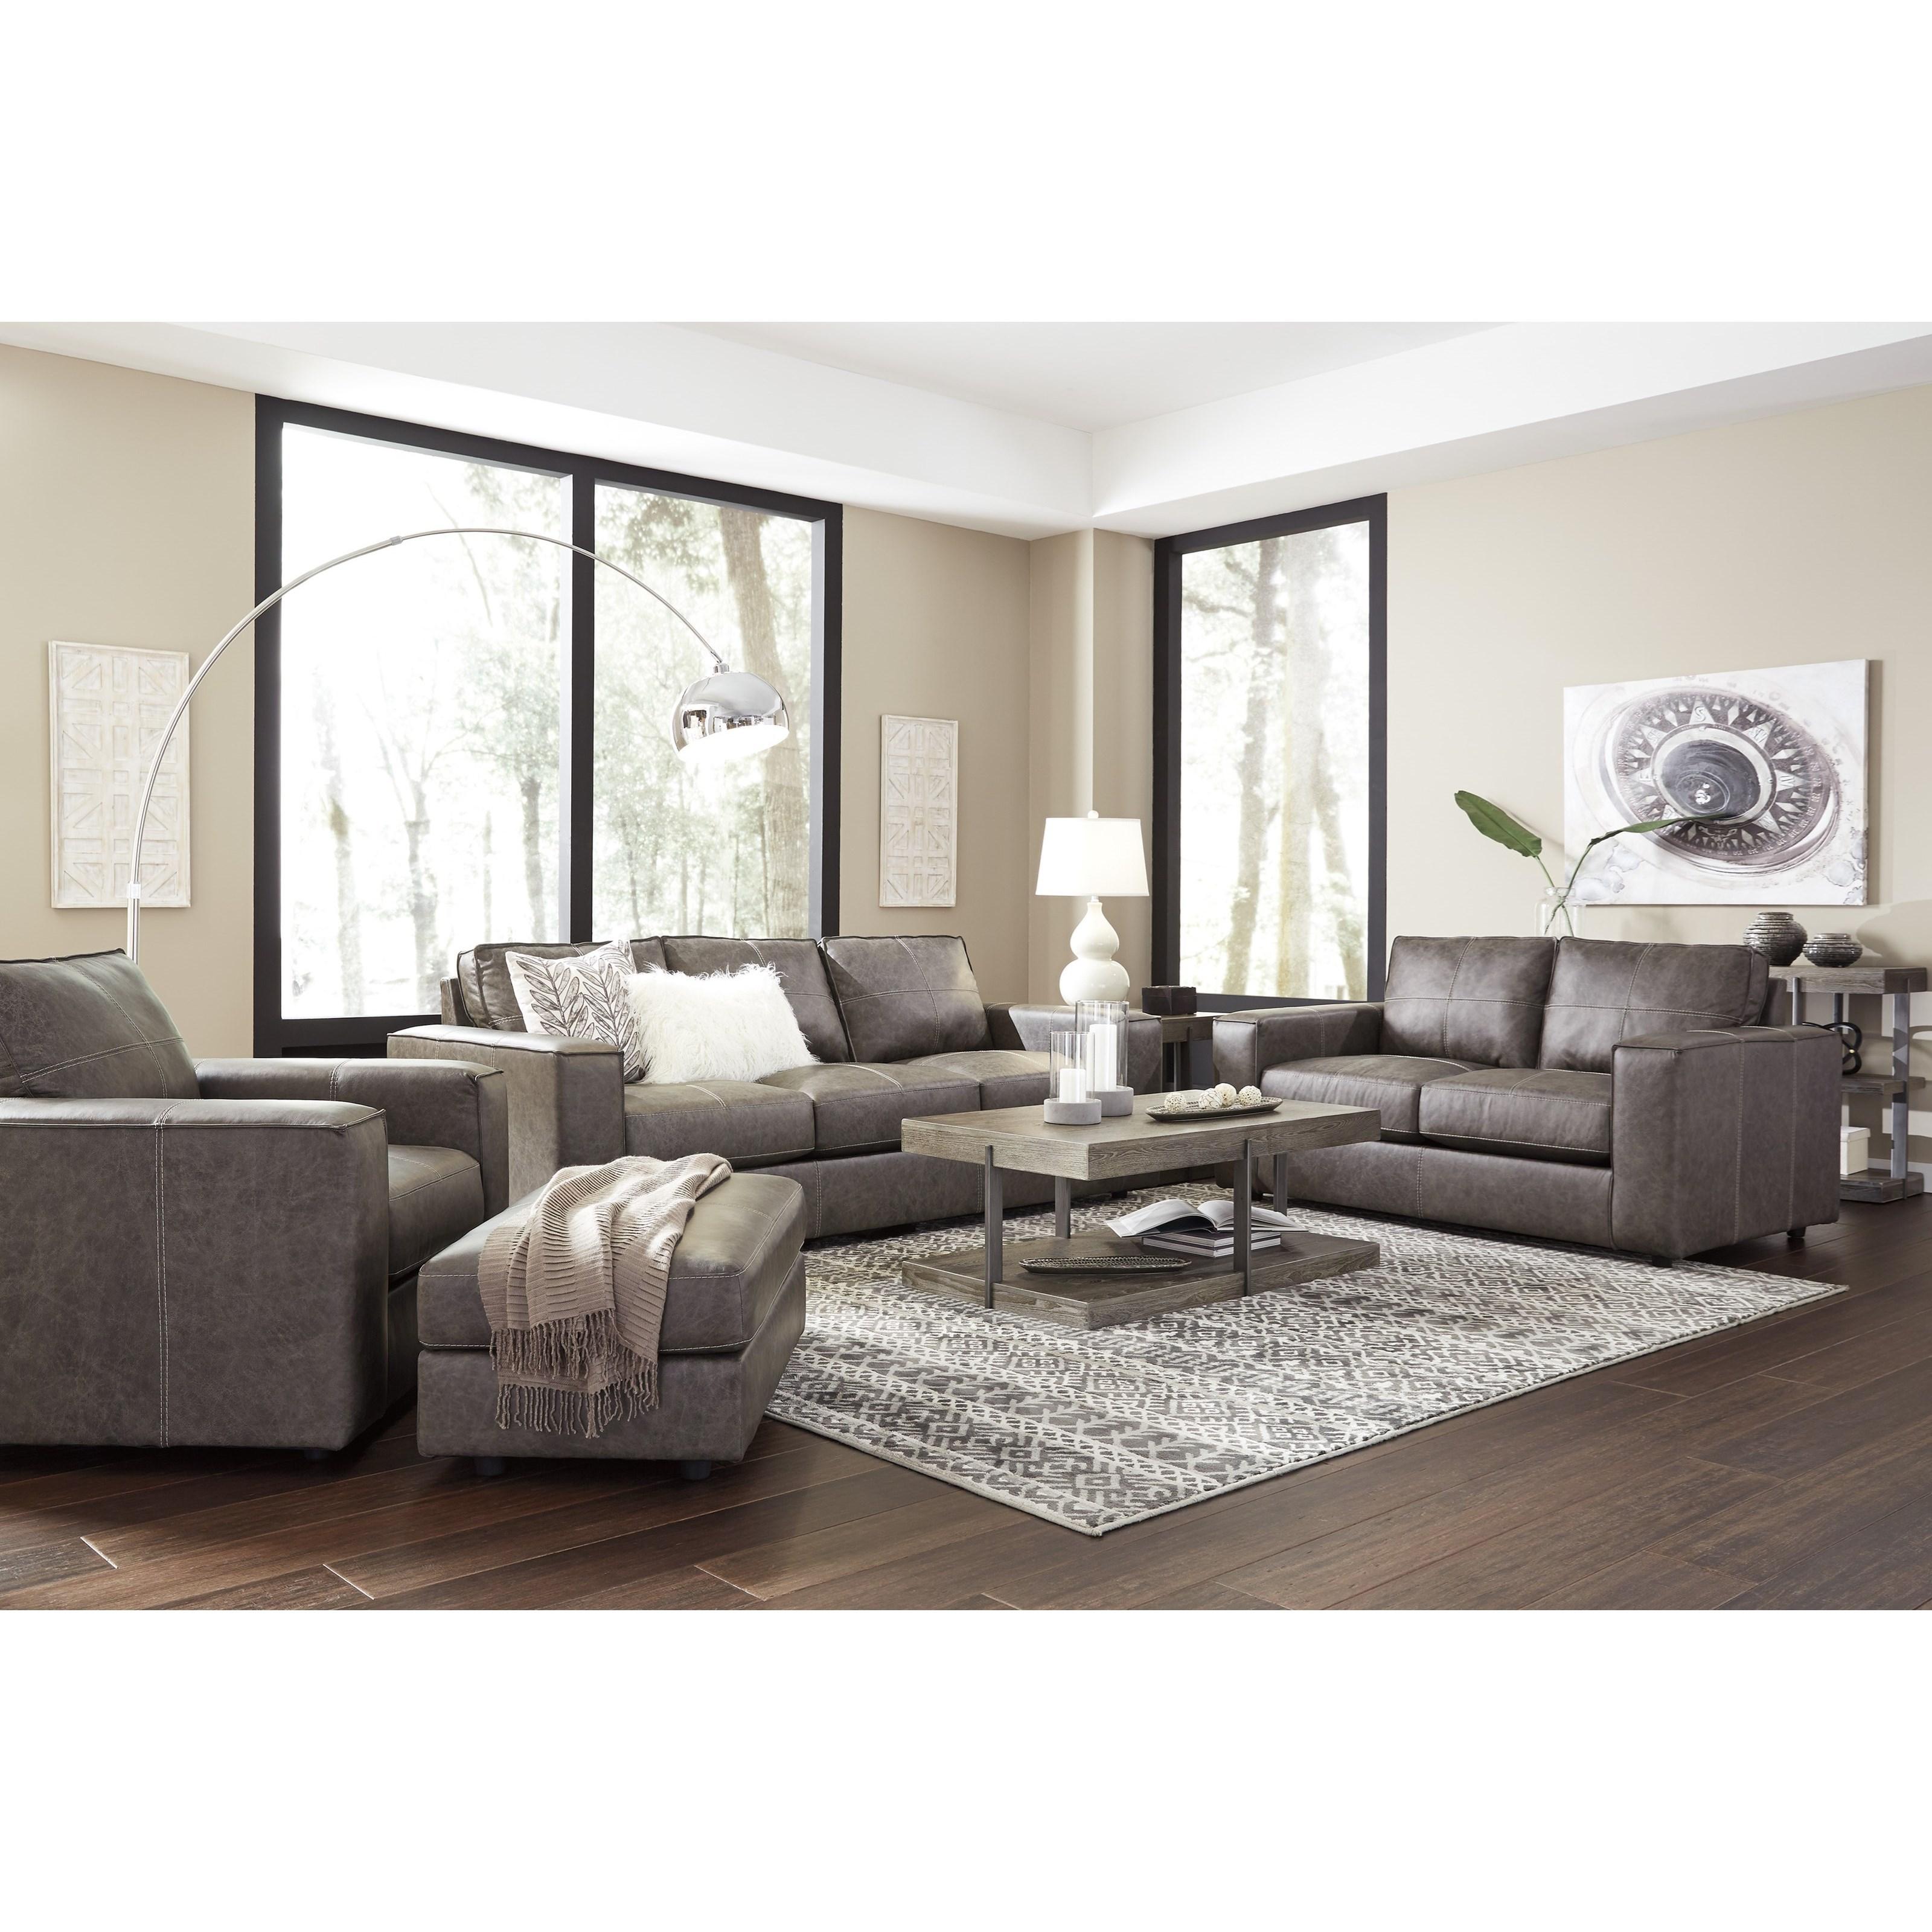 Signature Design By Ashley Trembolt Living Room Group